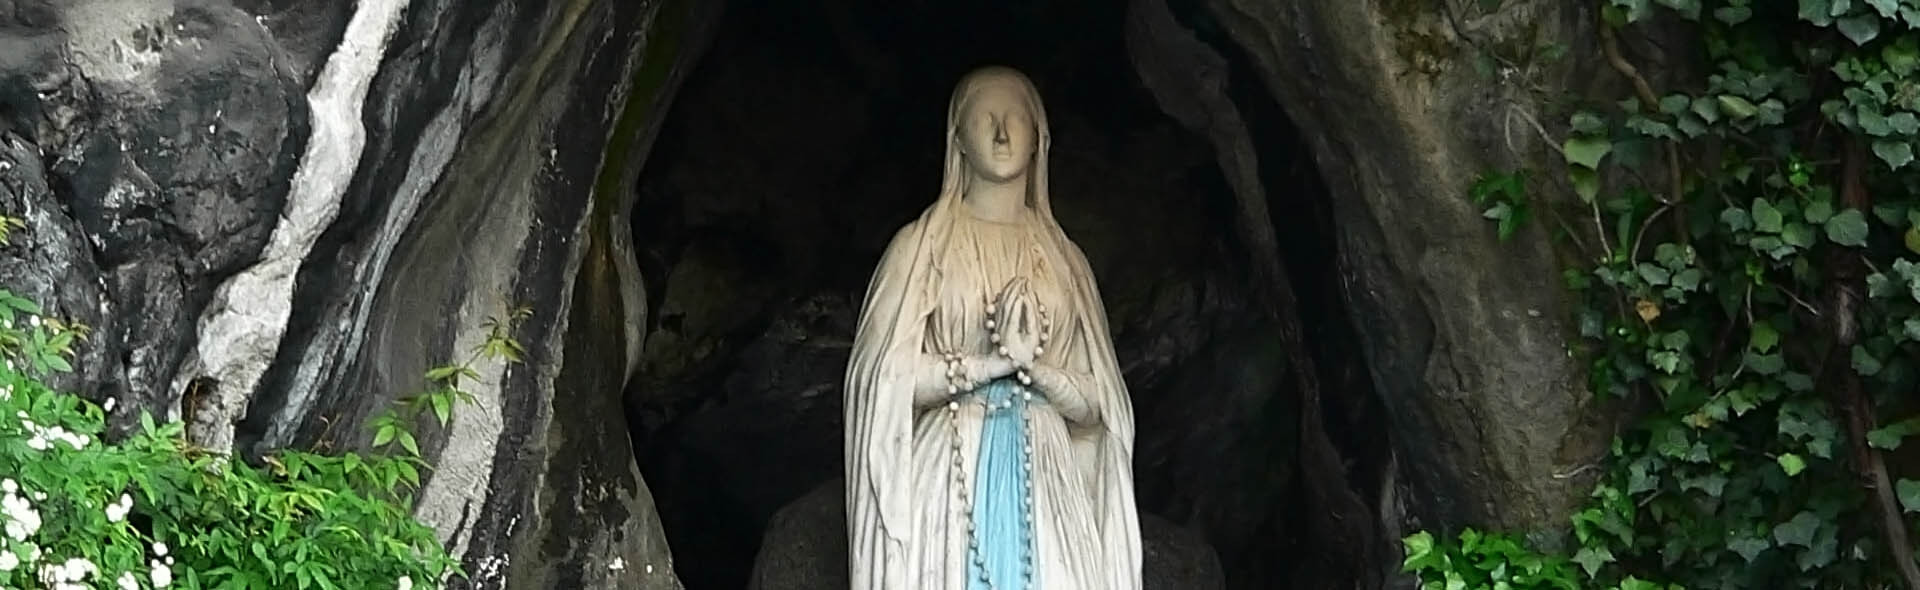 Viaggio a Lourdes in Aereo da Roma Assunta